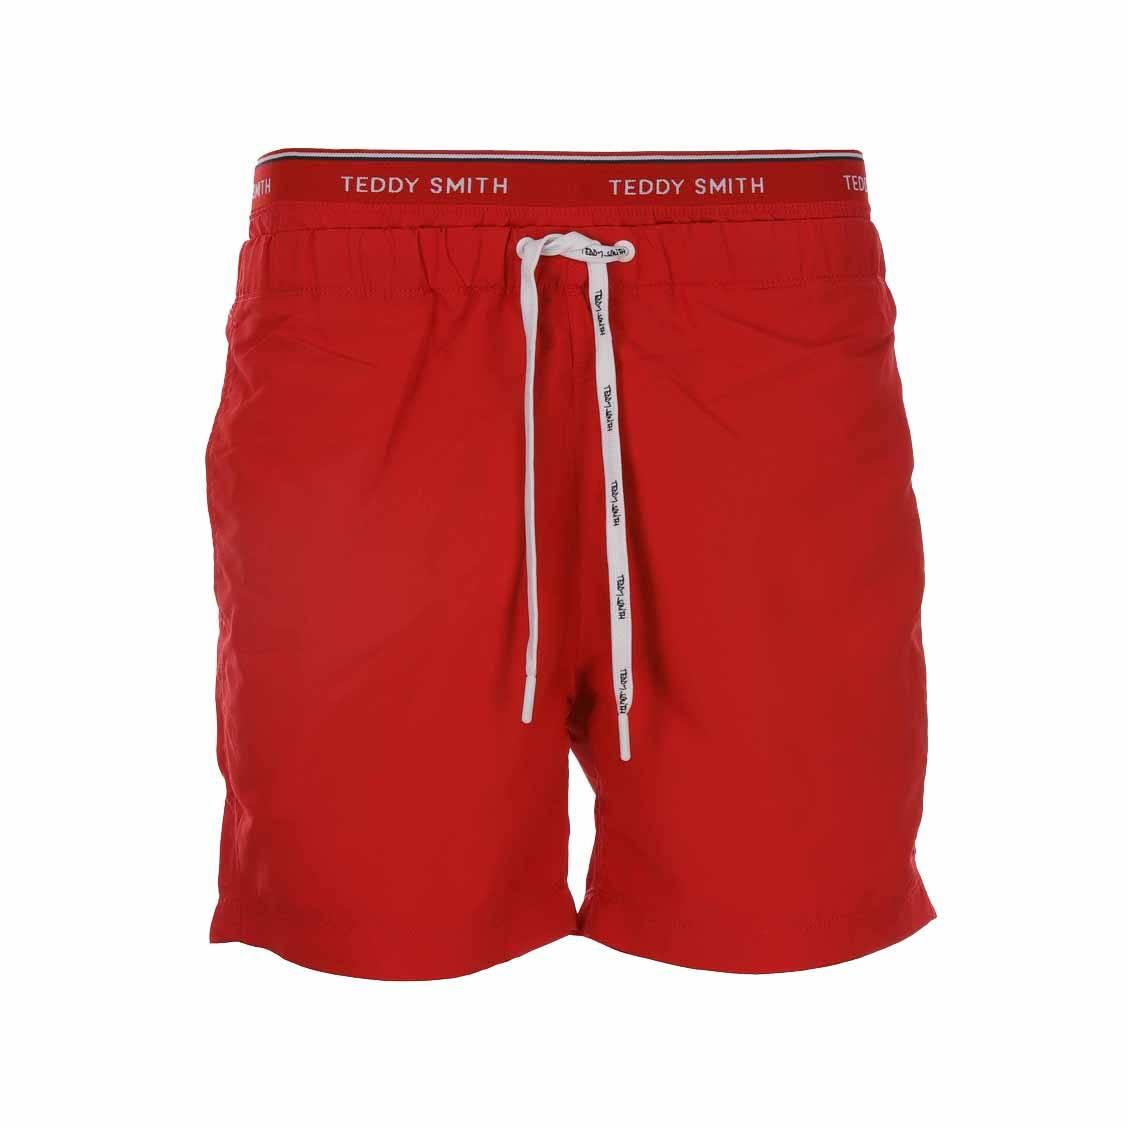 Short de bain Teddy Smith Saker rouge